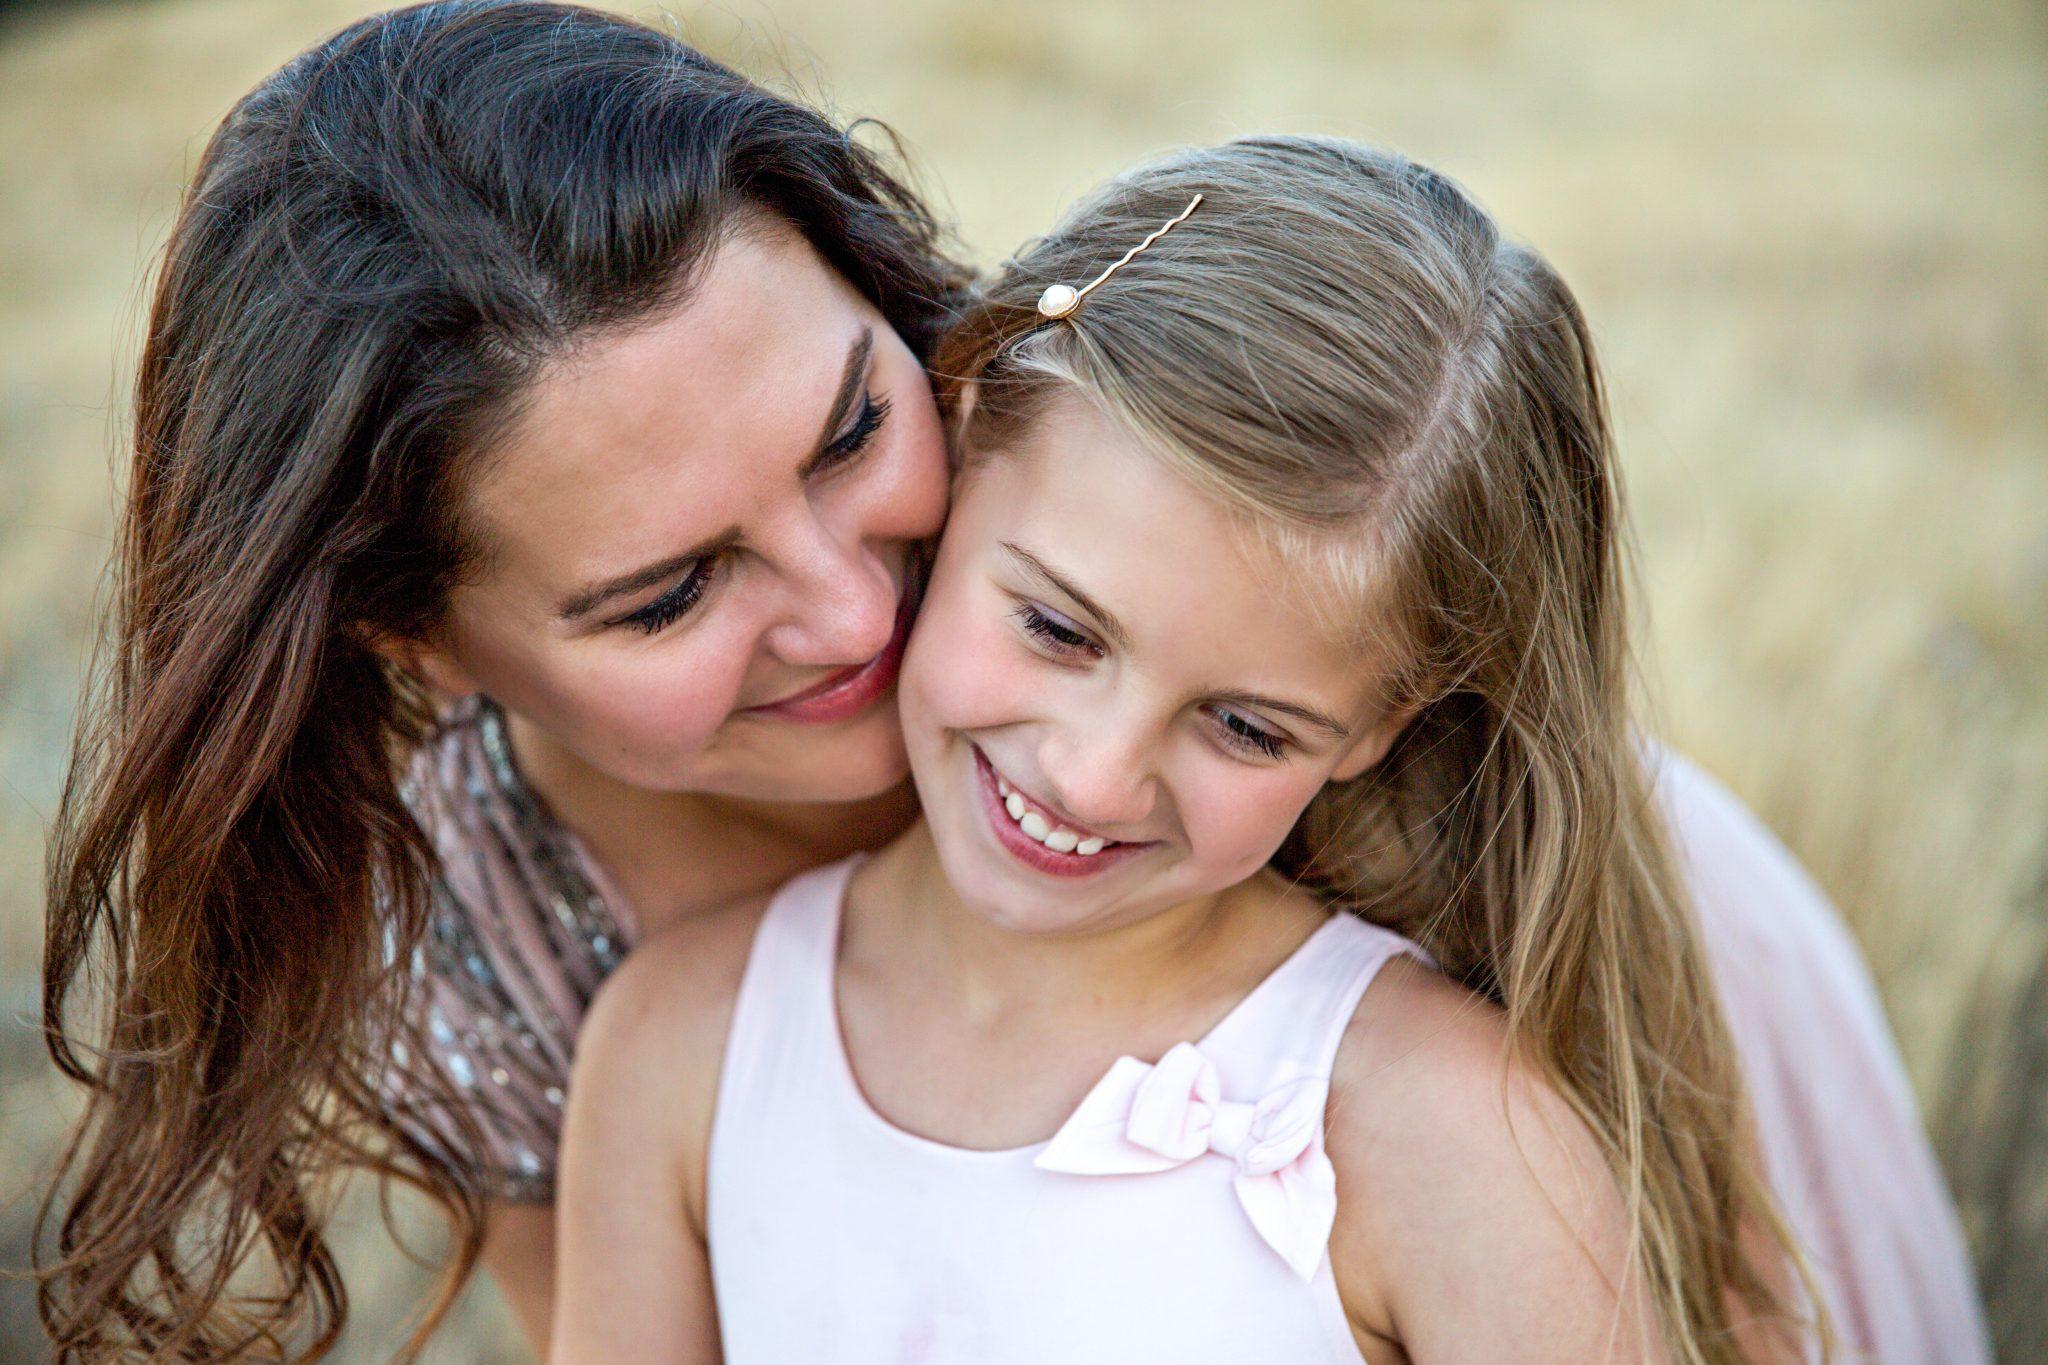 Análisis capilar - foto de madre e hija - Farmacia Ciudad Alta